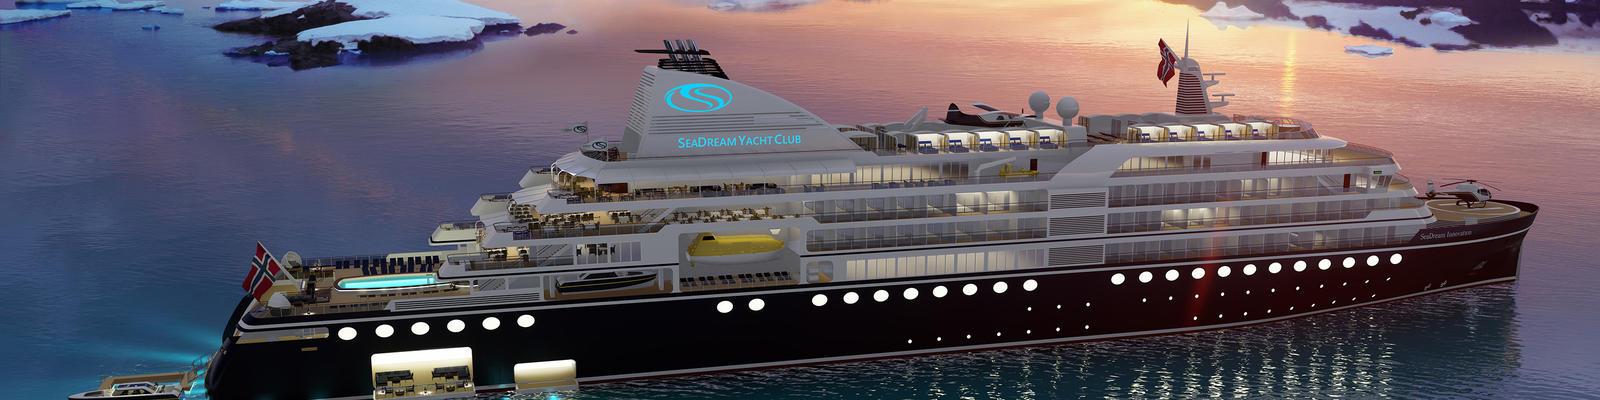 SeaDream Innovation cruise ship (Photo: SeaDream Yacht Club)